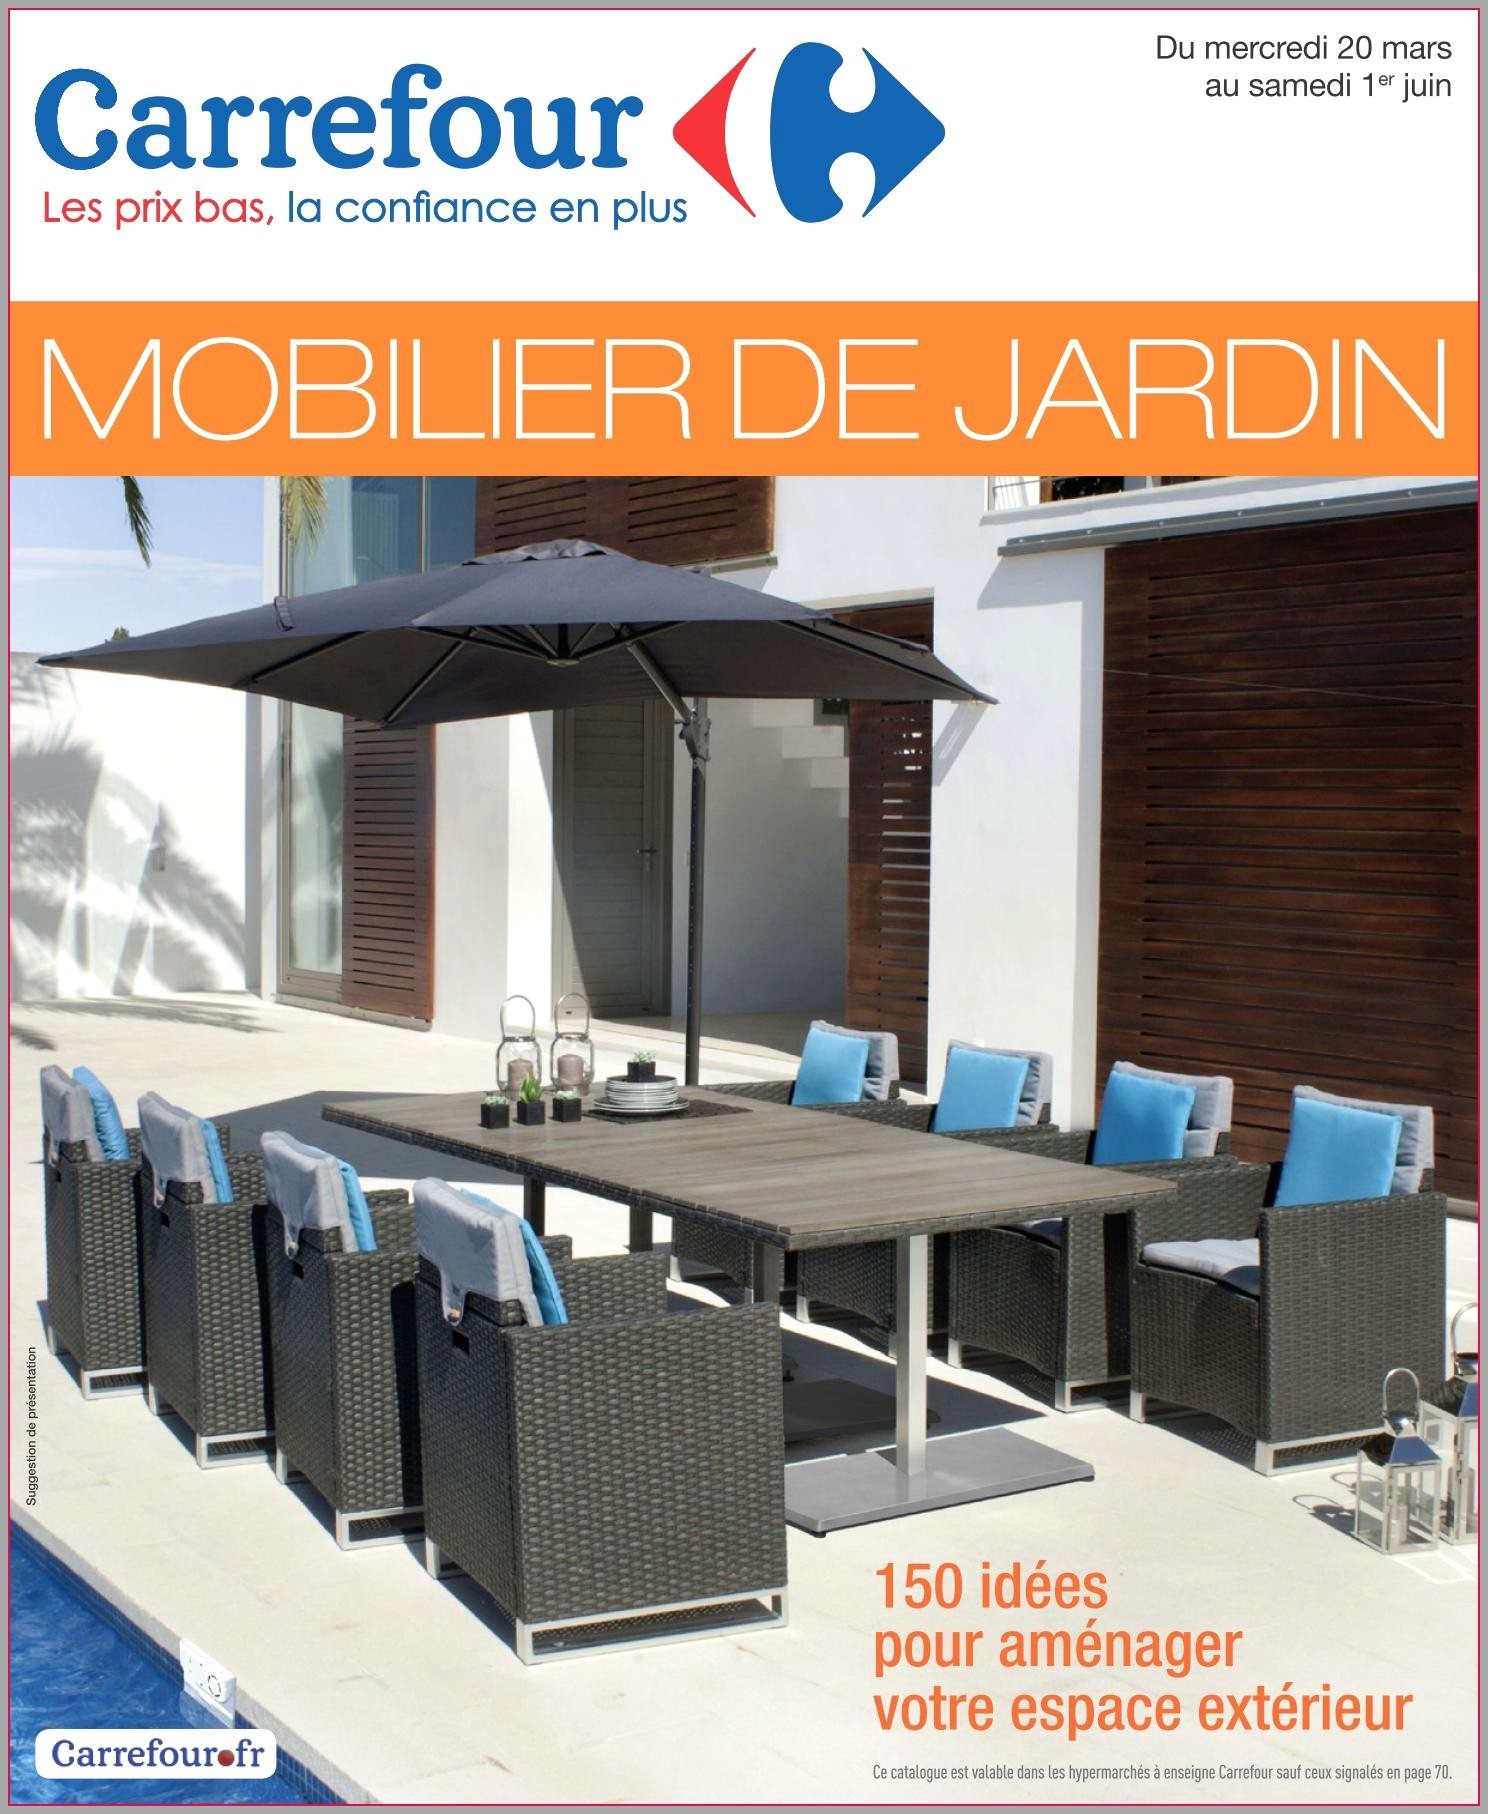 Salon de jardin chez carrefour market - Mailleraye.fr jardin